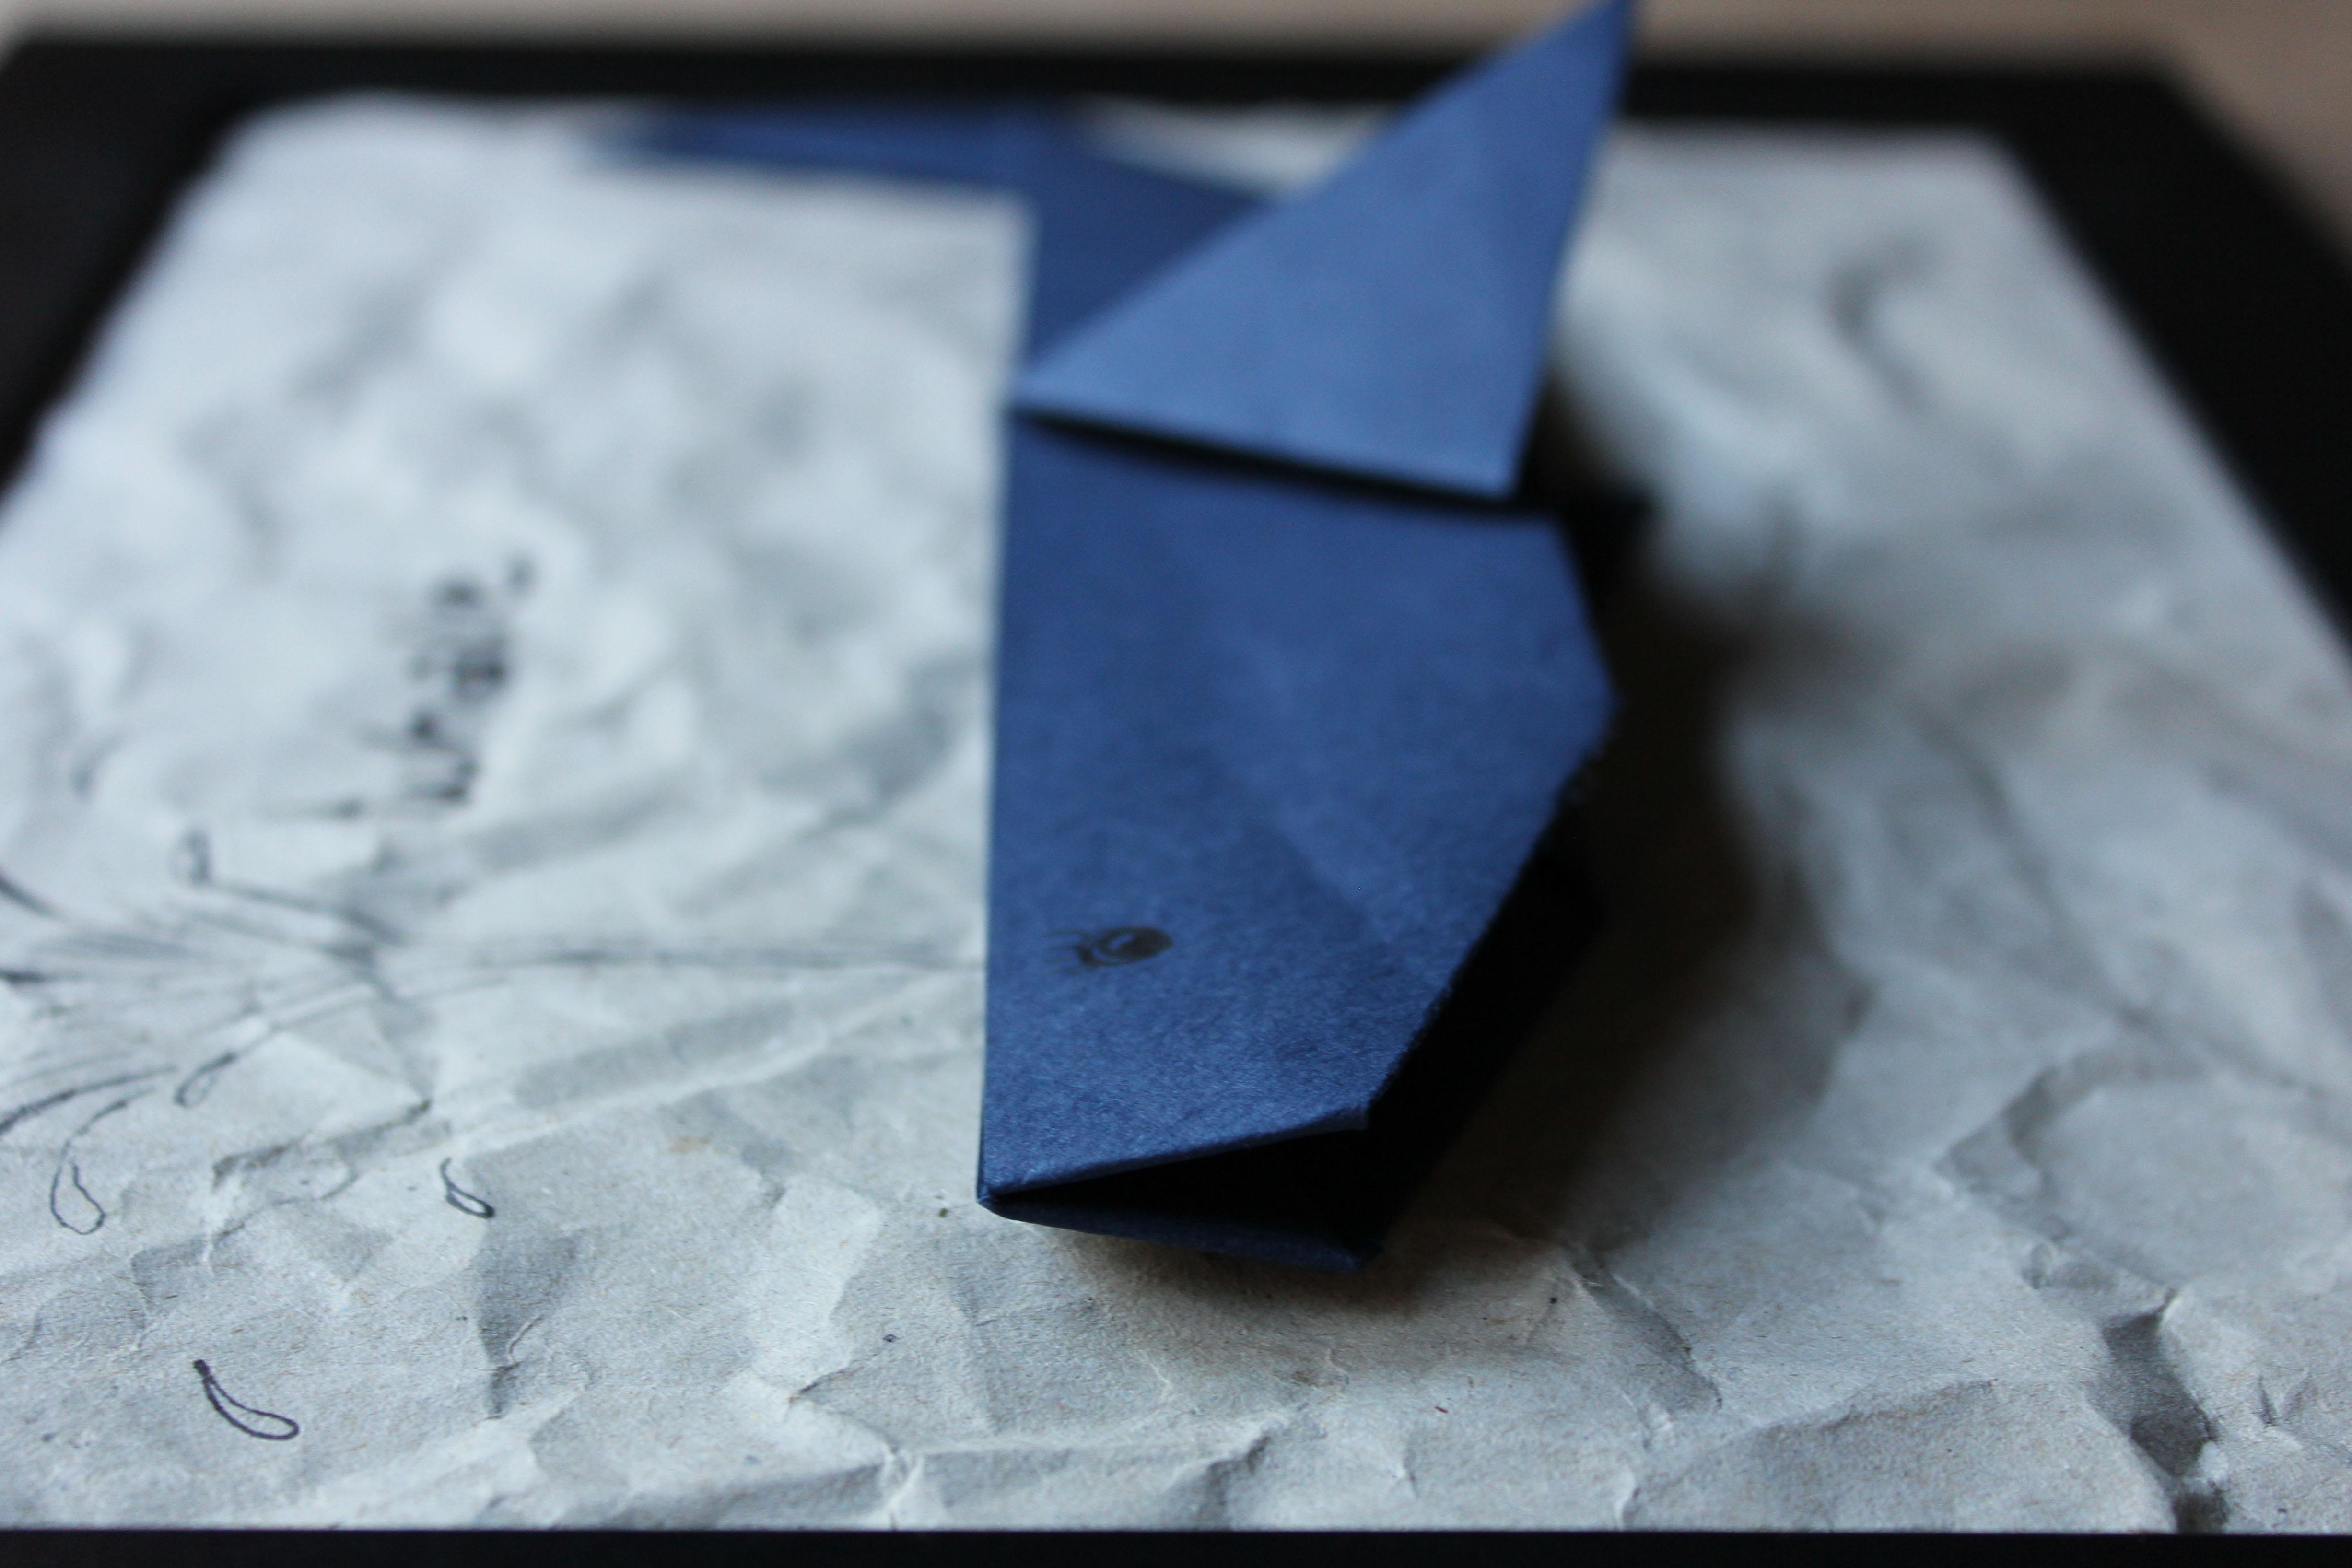 Origami Bilder. - Oh, wie wundervoll.